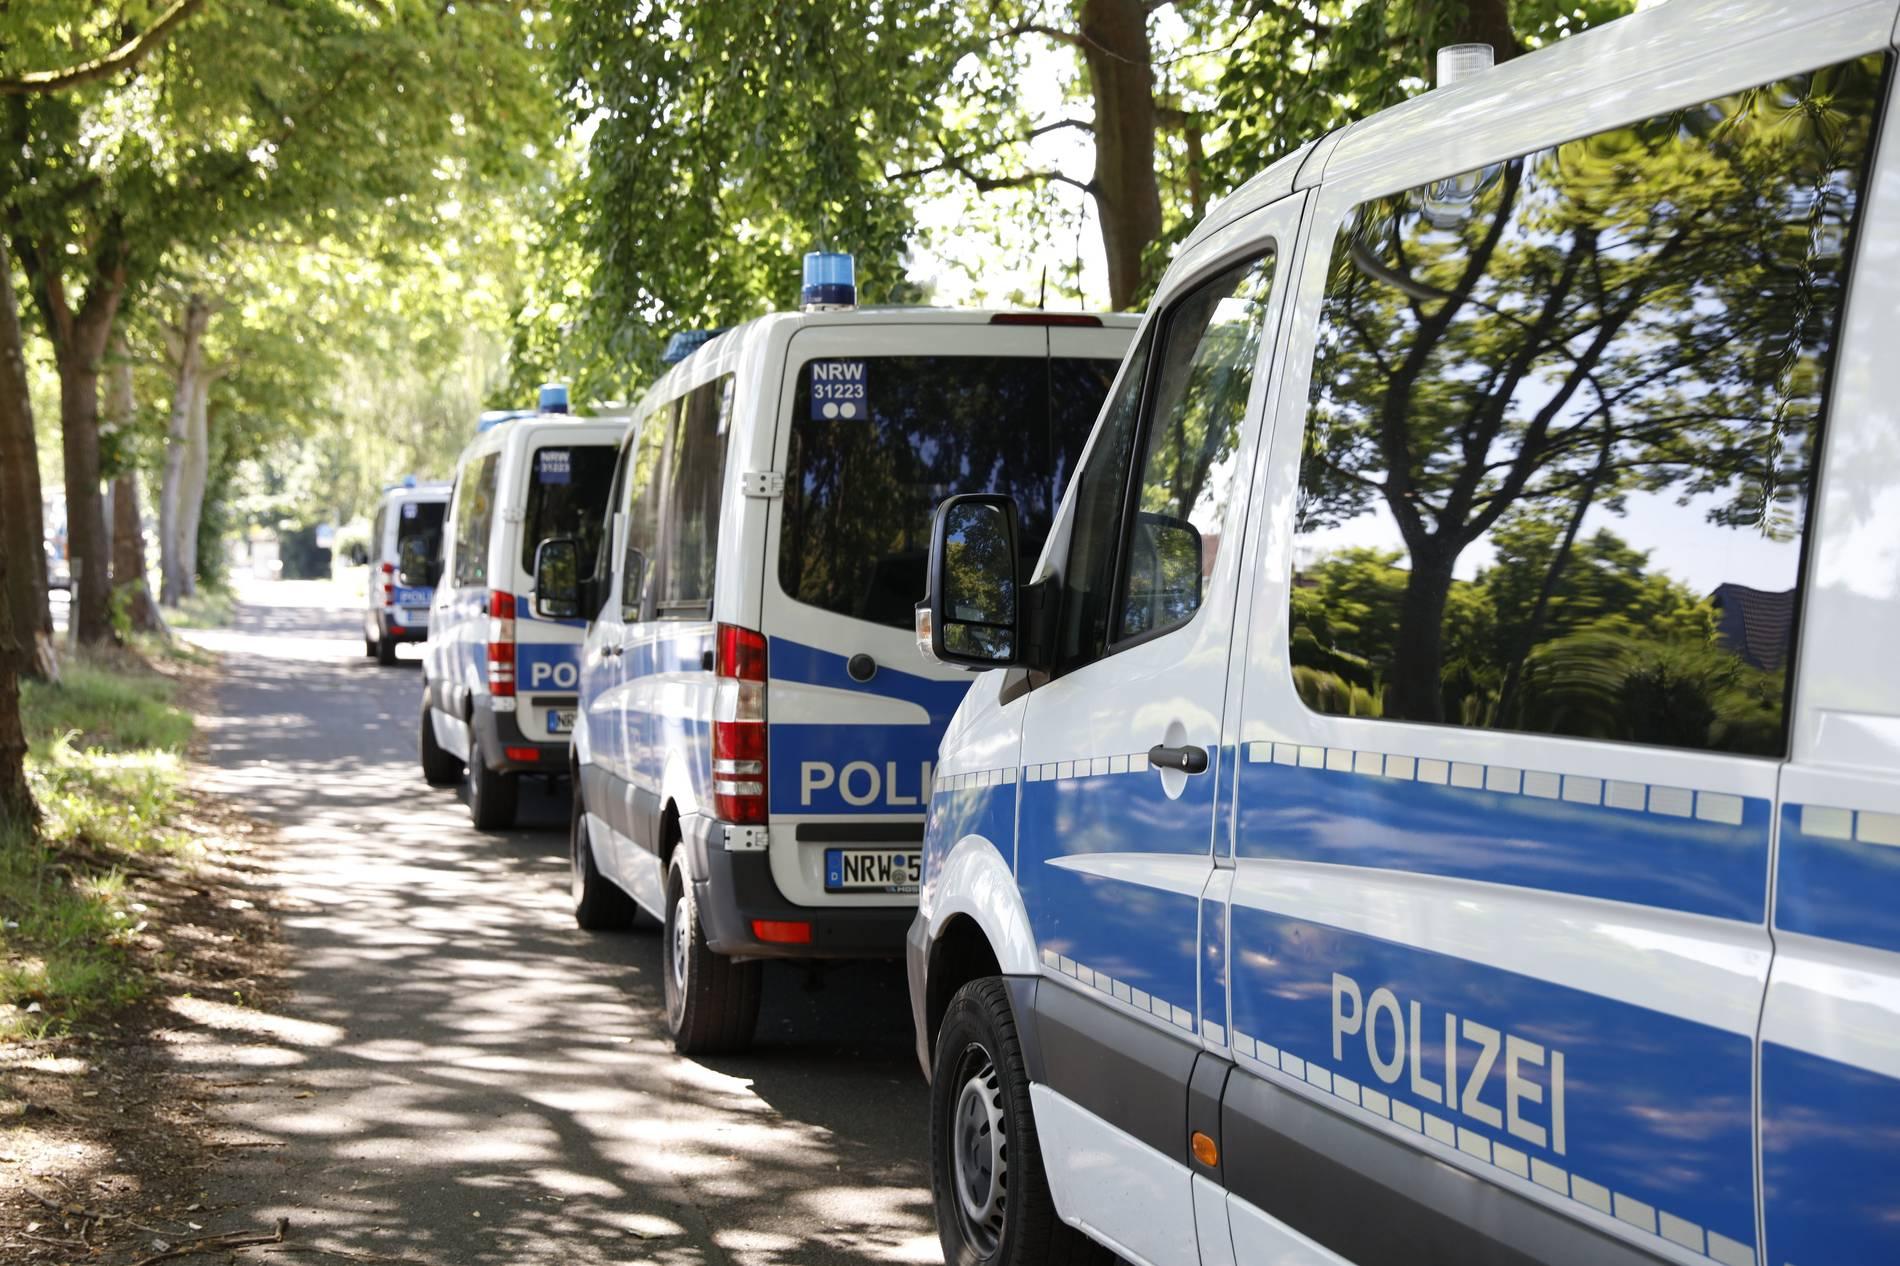 Bei Dreharbeiten in Köln - Angriff auf RTL-Team!